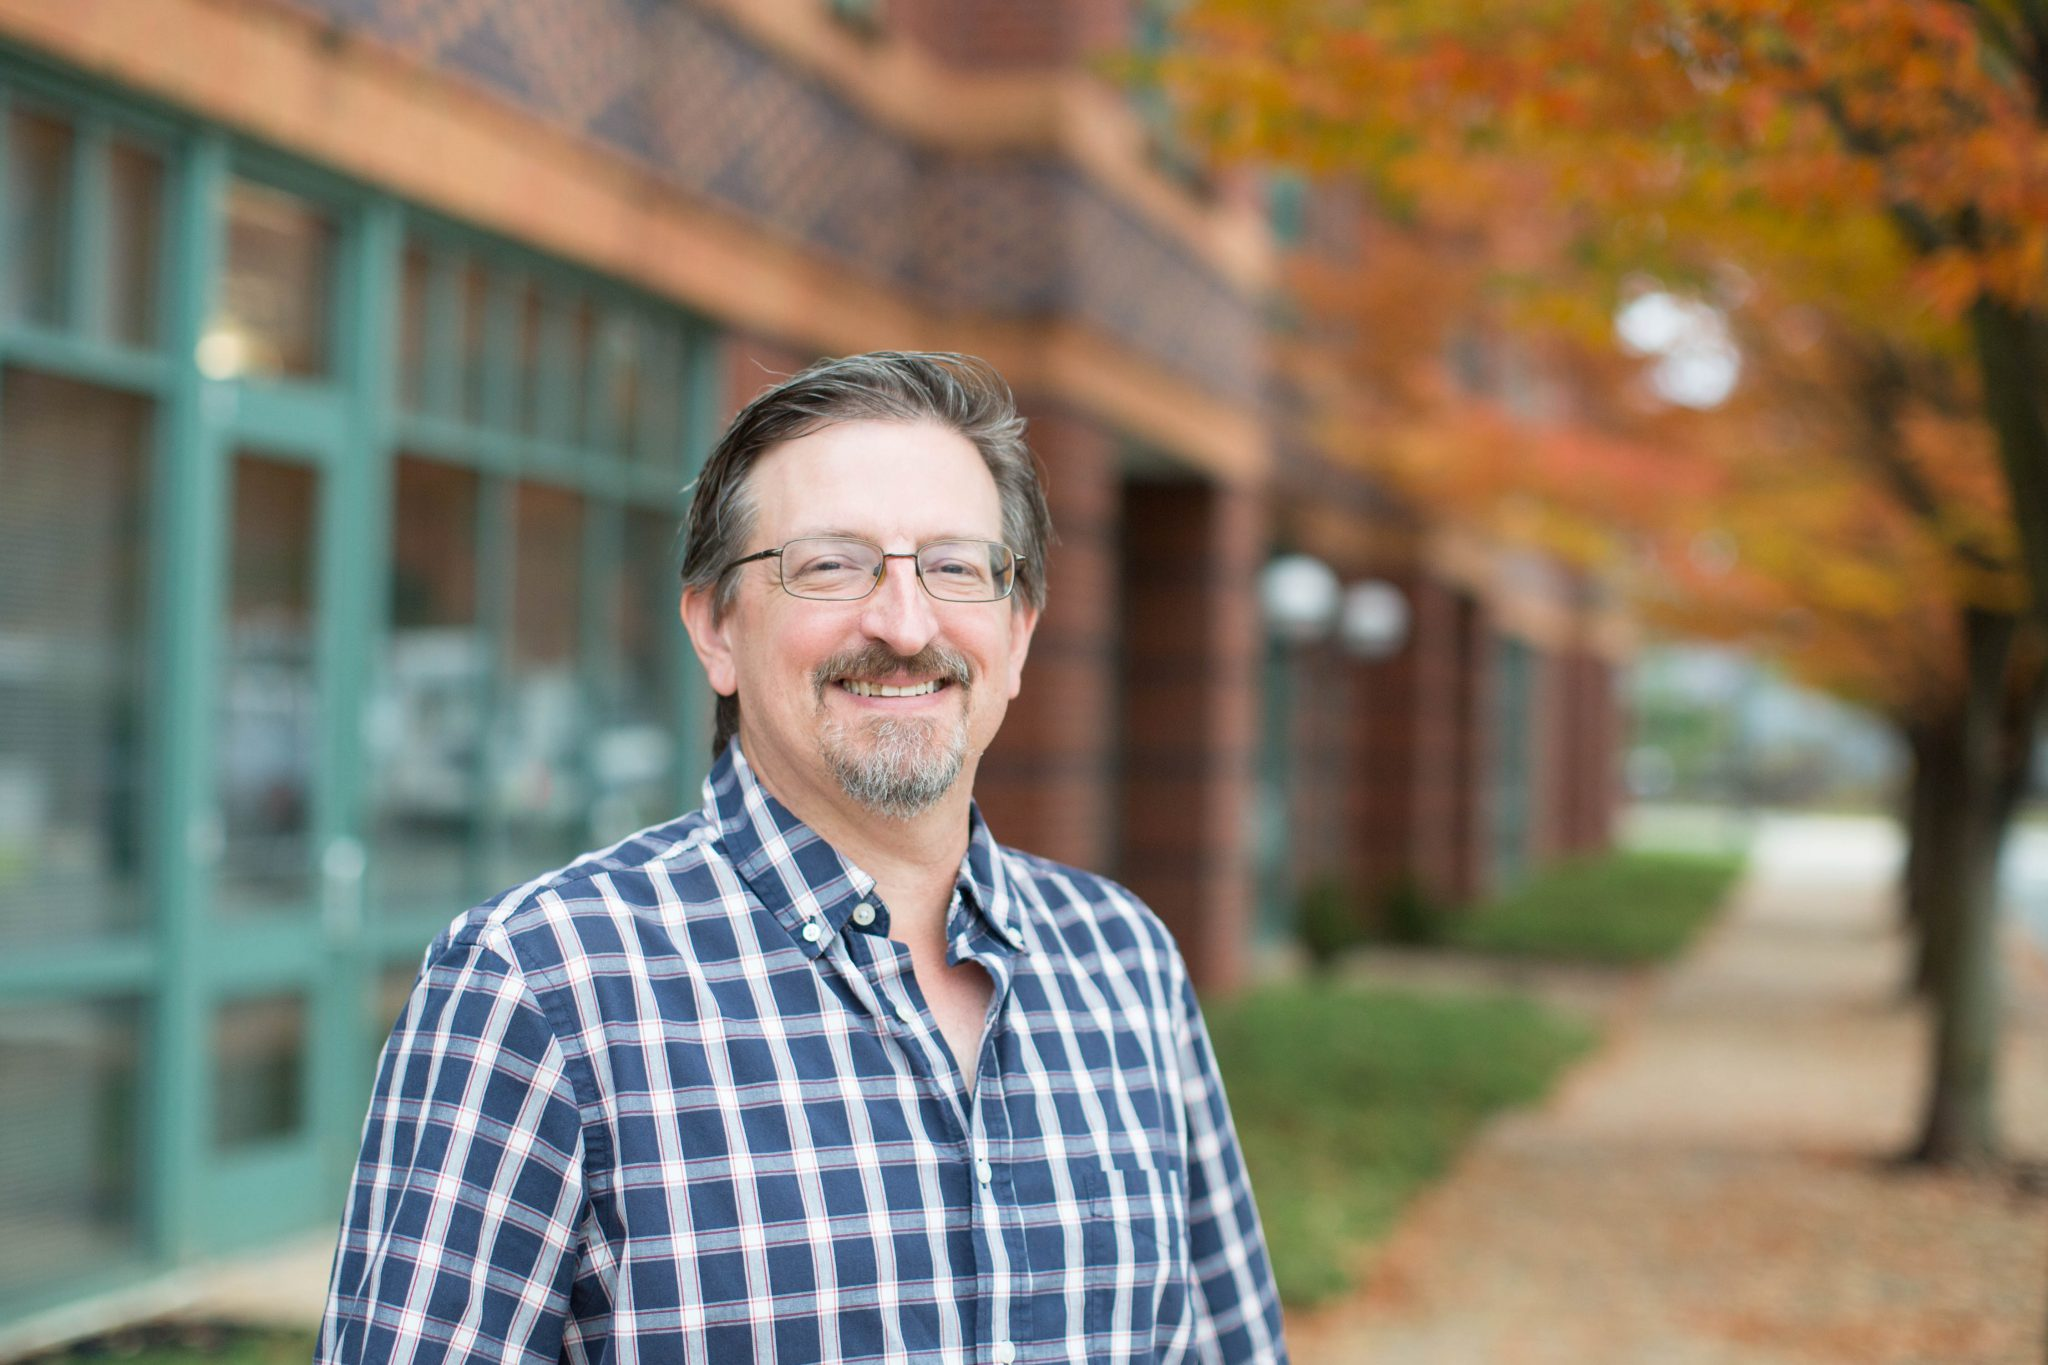 Joe Scerbo, CPD, celebrates 10 years with 2RW